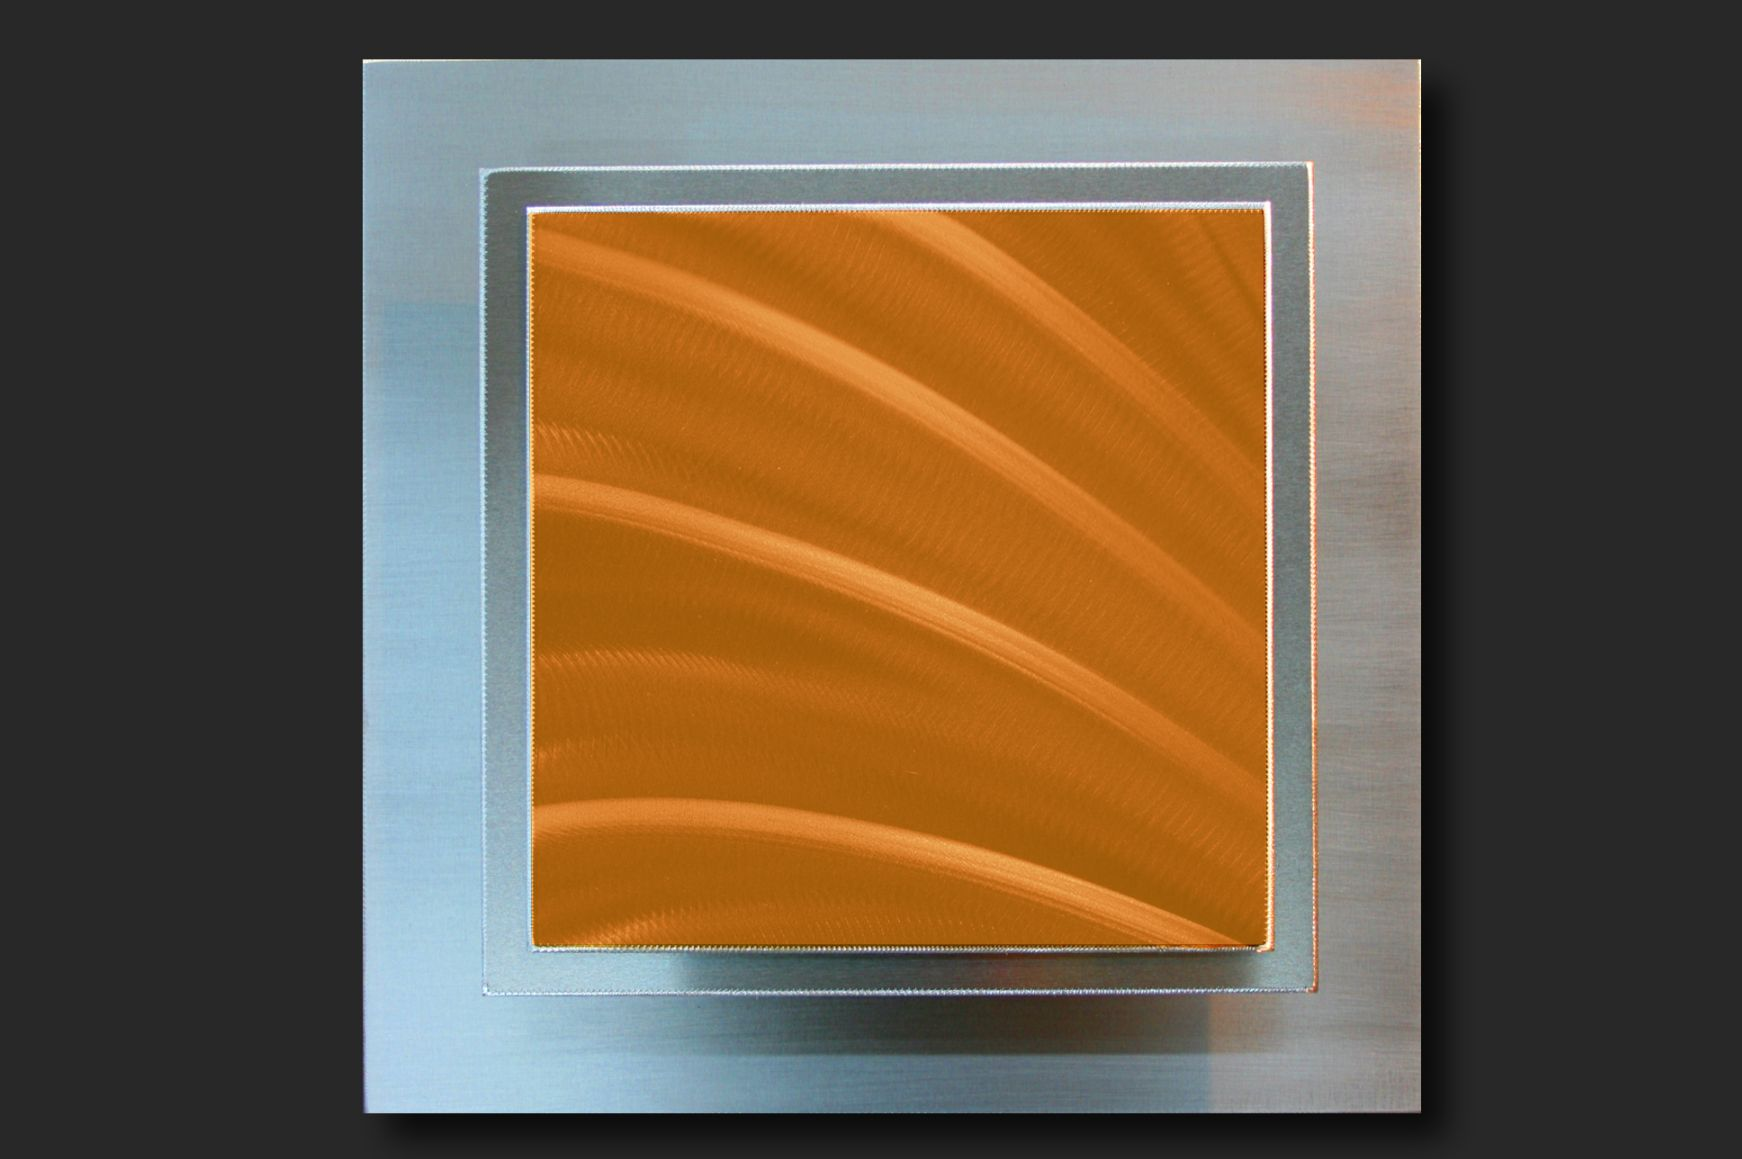 NY0689M - Metal Art by Nicholas Yust, Alternate Angle 4